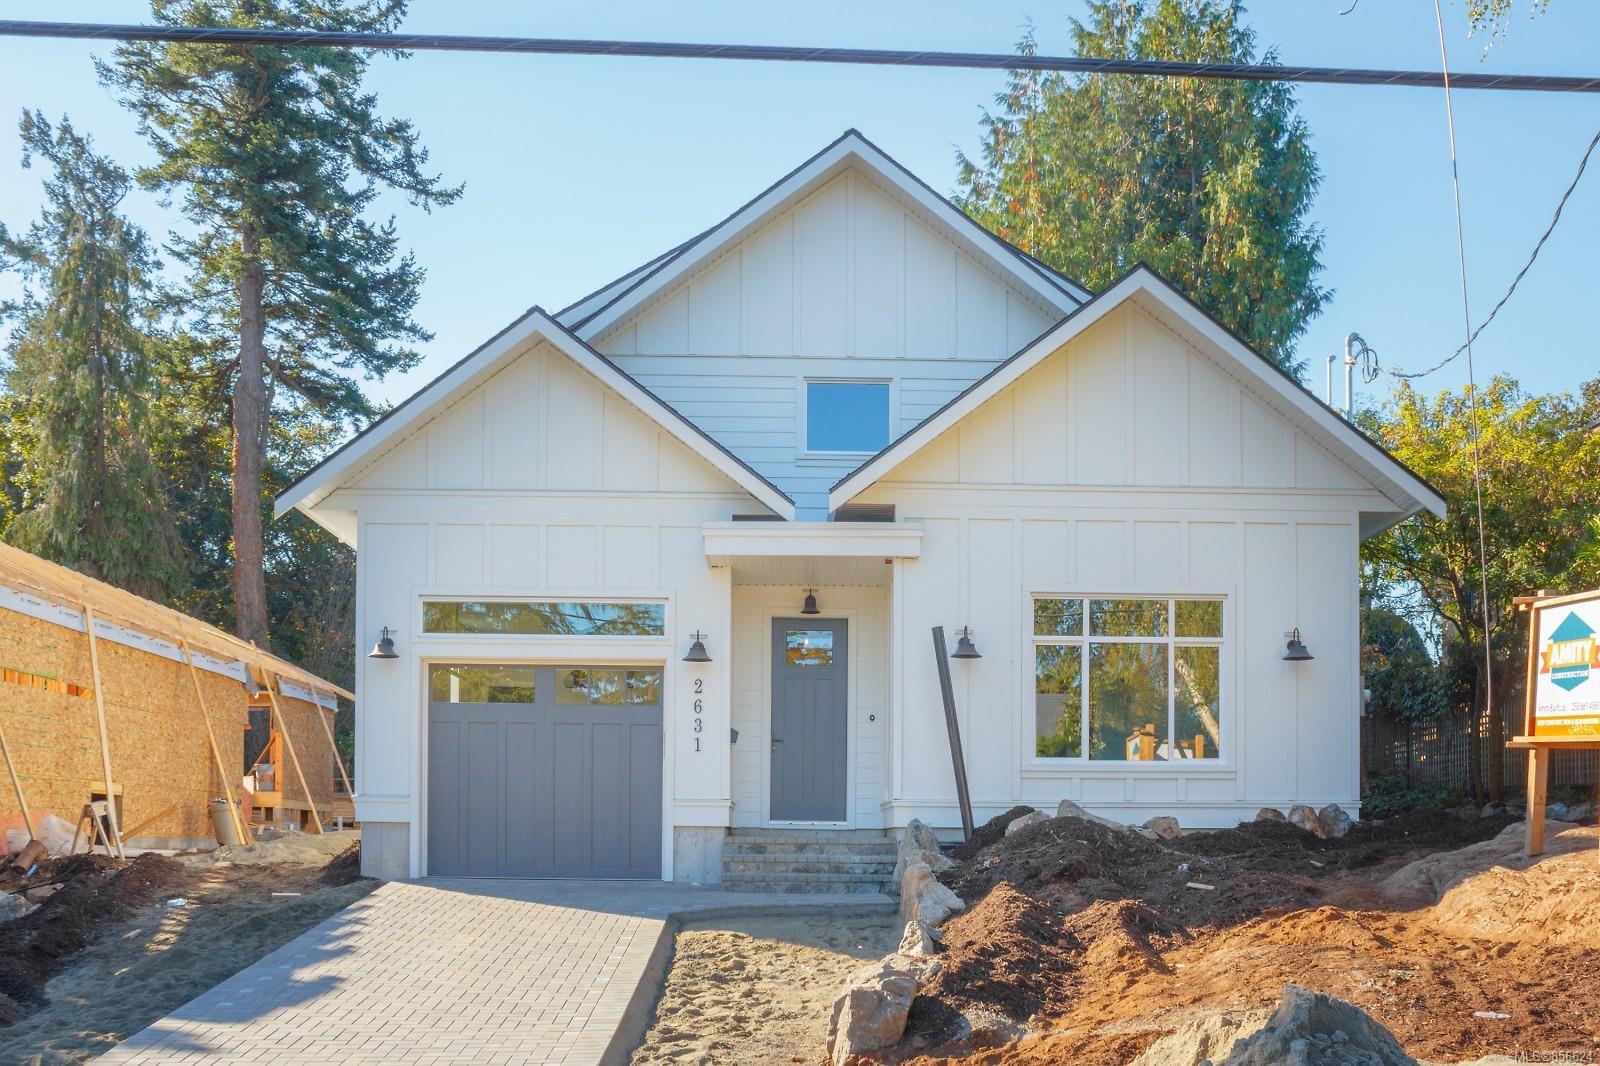 Main Photo: 2631 Margate Ave in : OB South Oak Bay House for sale (Oak Bay)  : MLS®# 856624